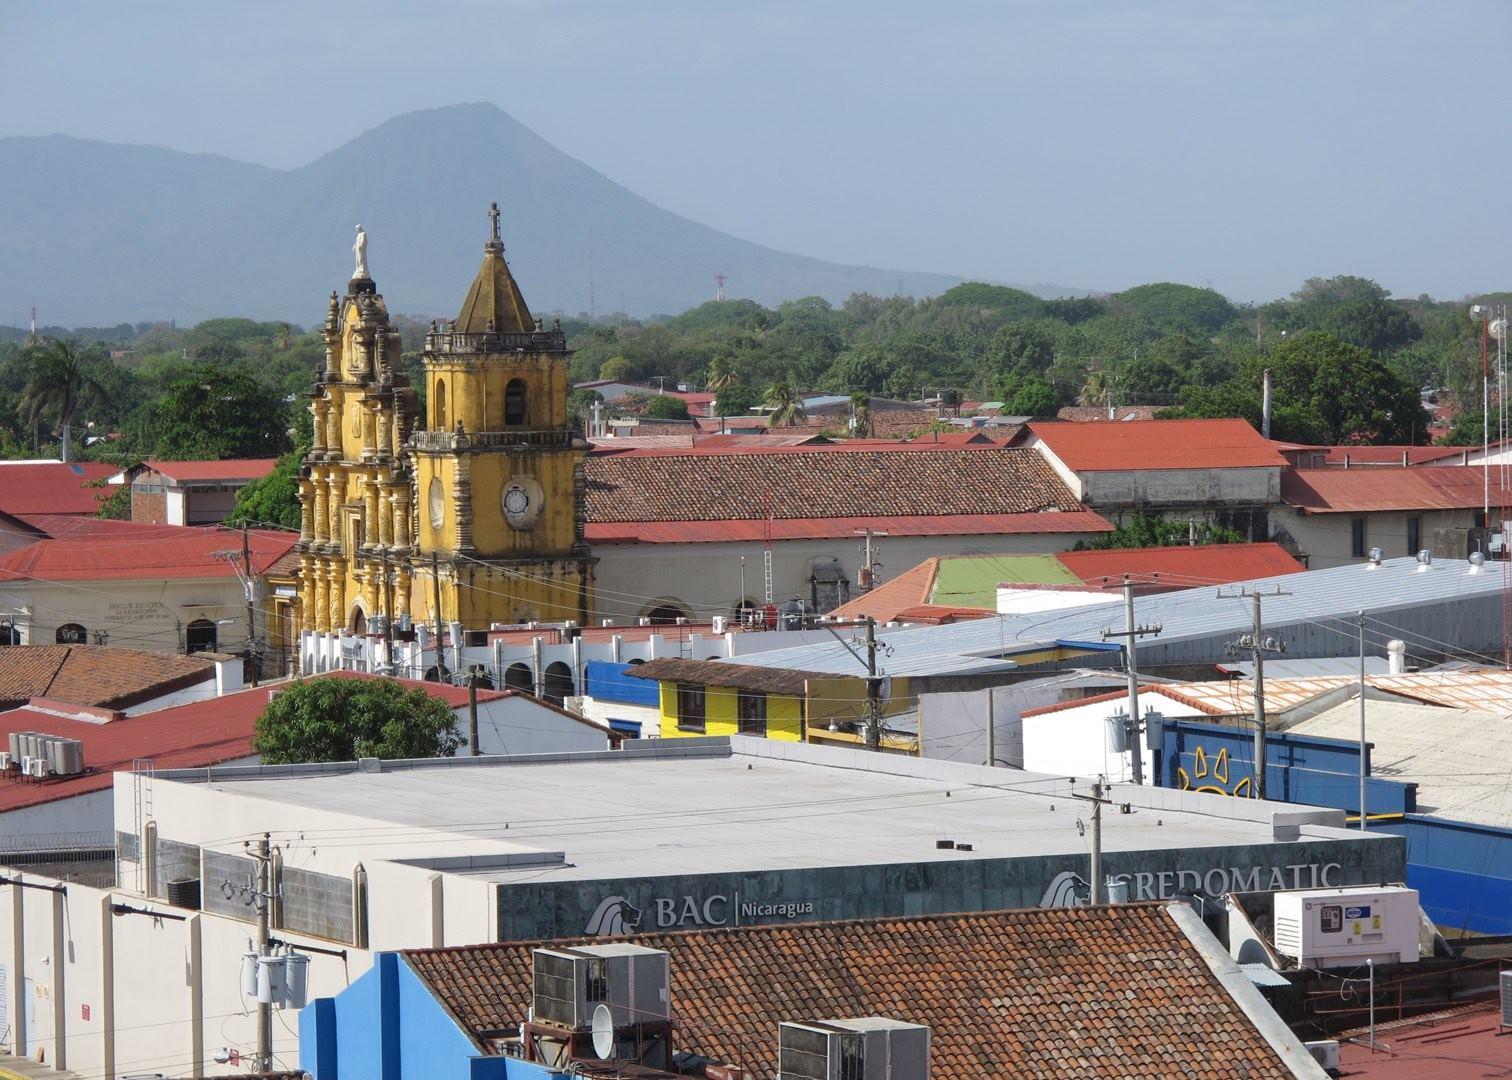 leon city nicaragua choice image